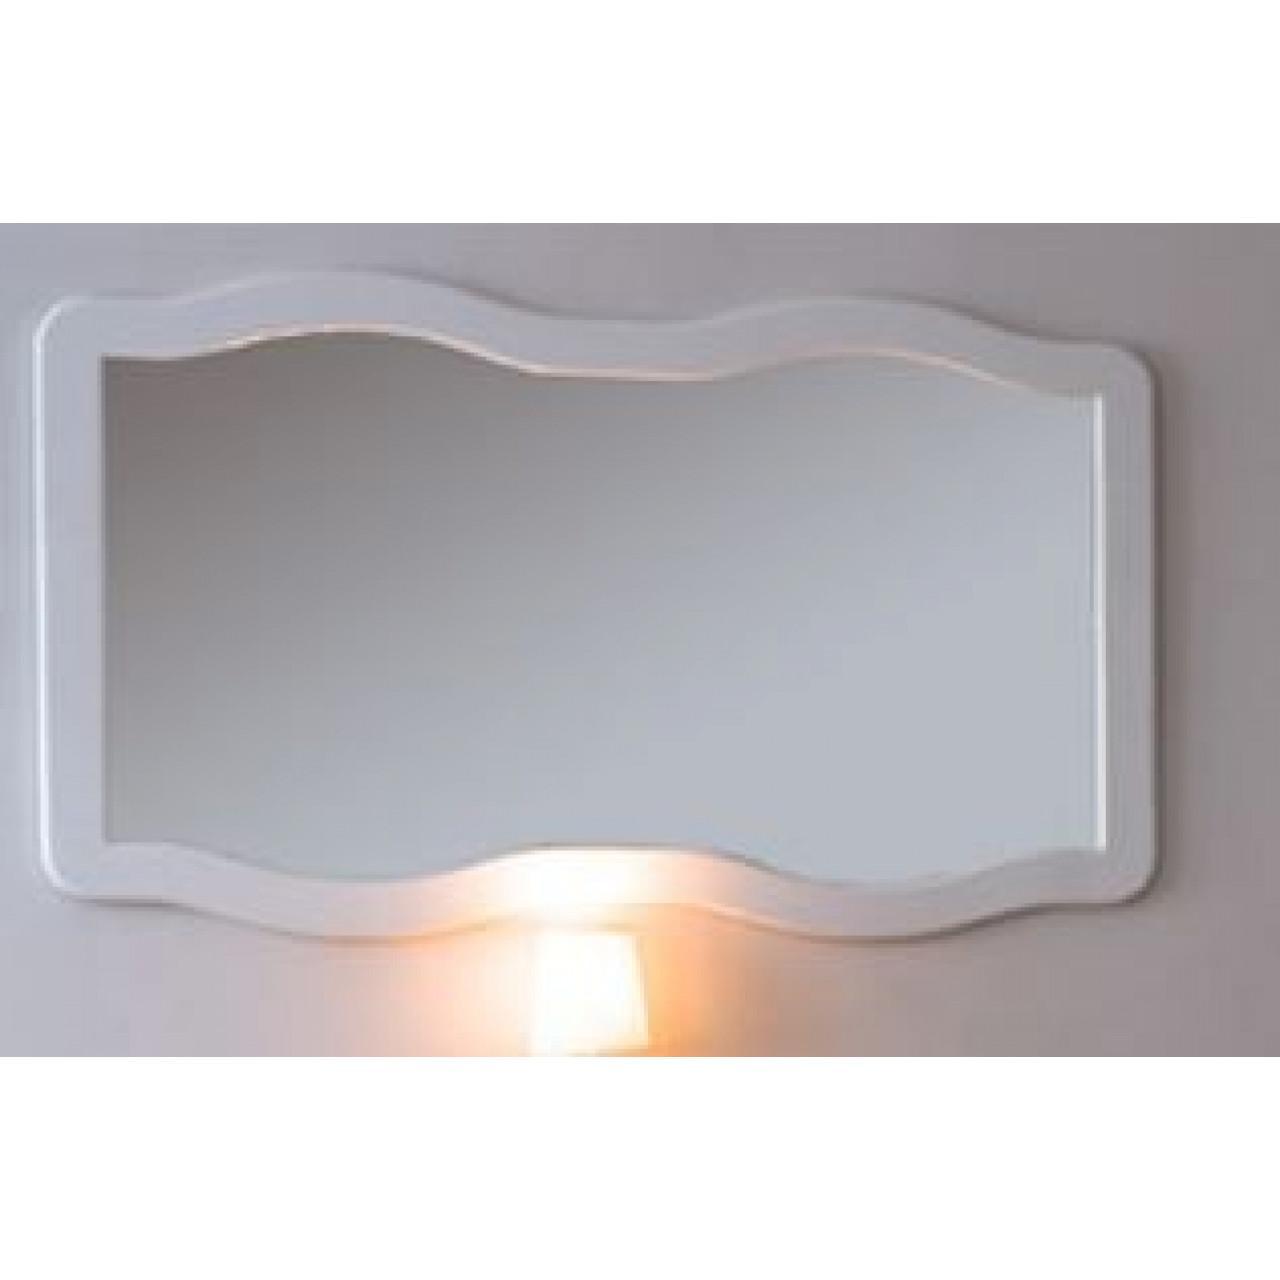 Зеркало Аллигатор Роял Комфорт N(M) 120 купить в Москве по цене от 14600р. в интернет-магазине mebel-v-vannu.ru